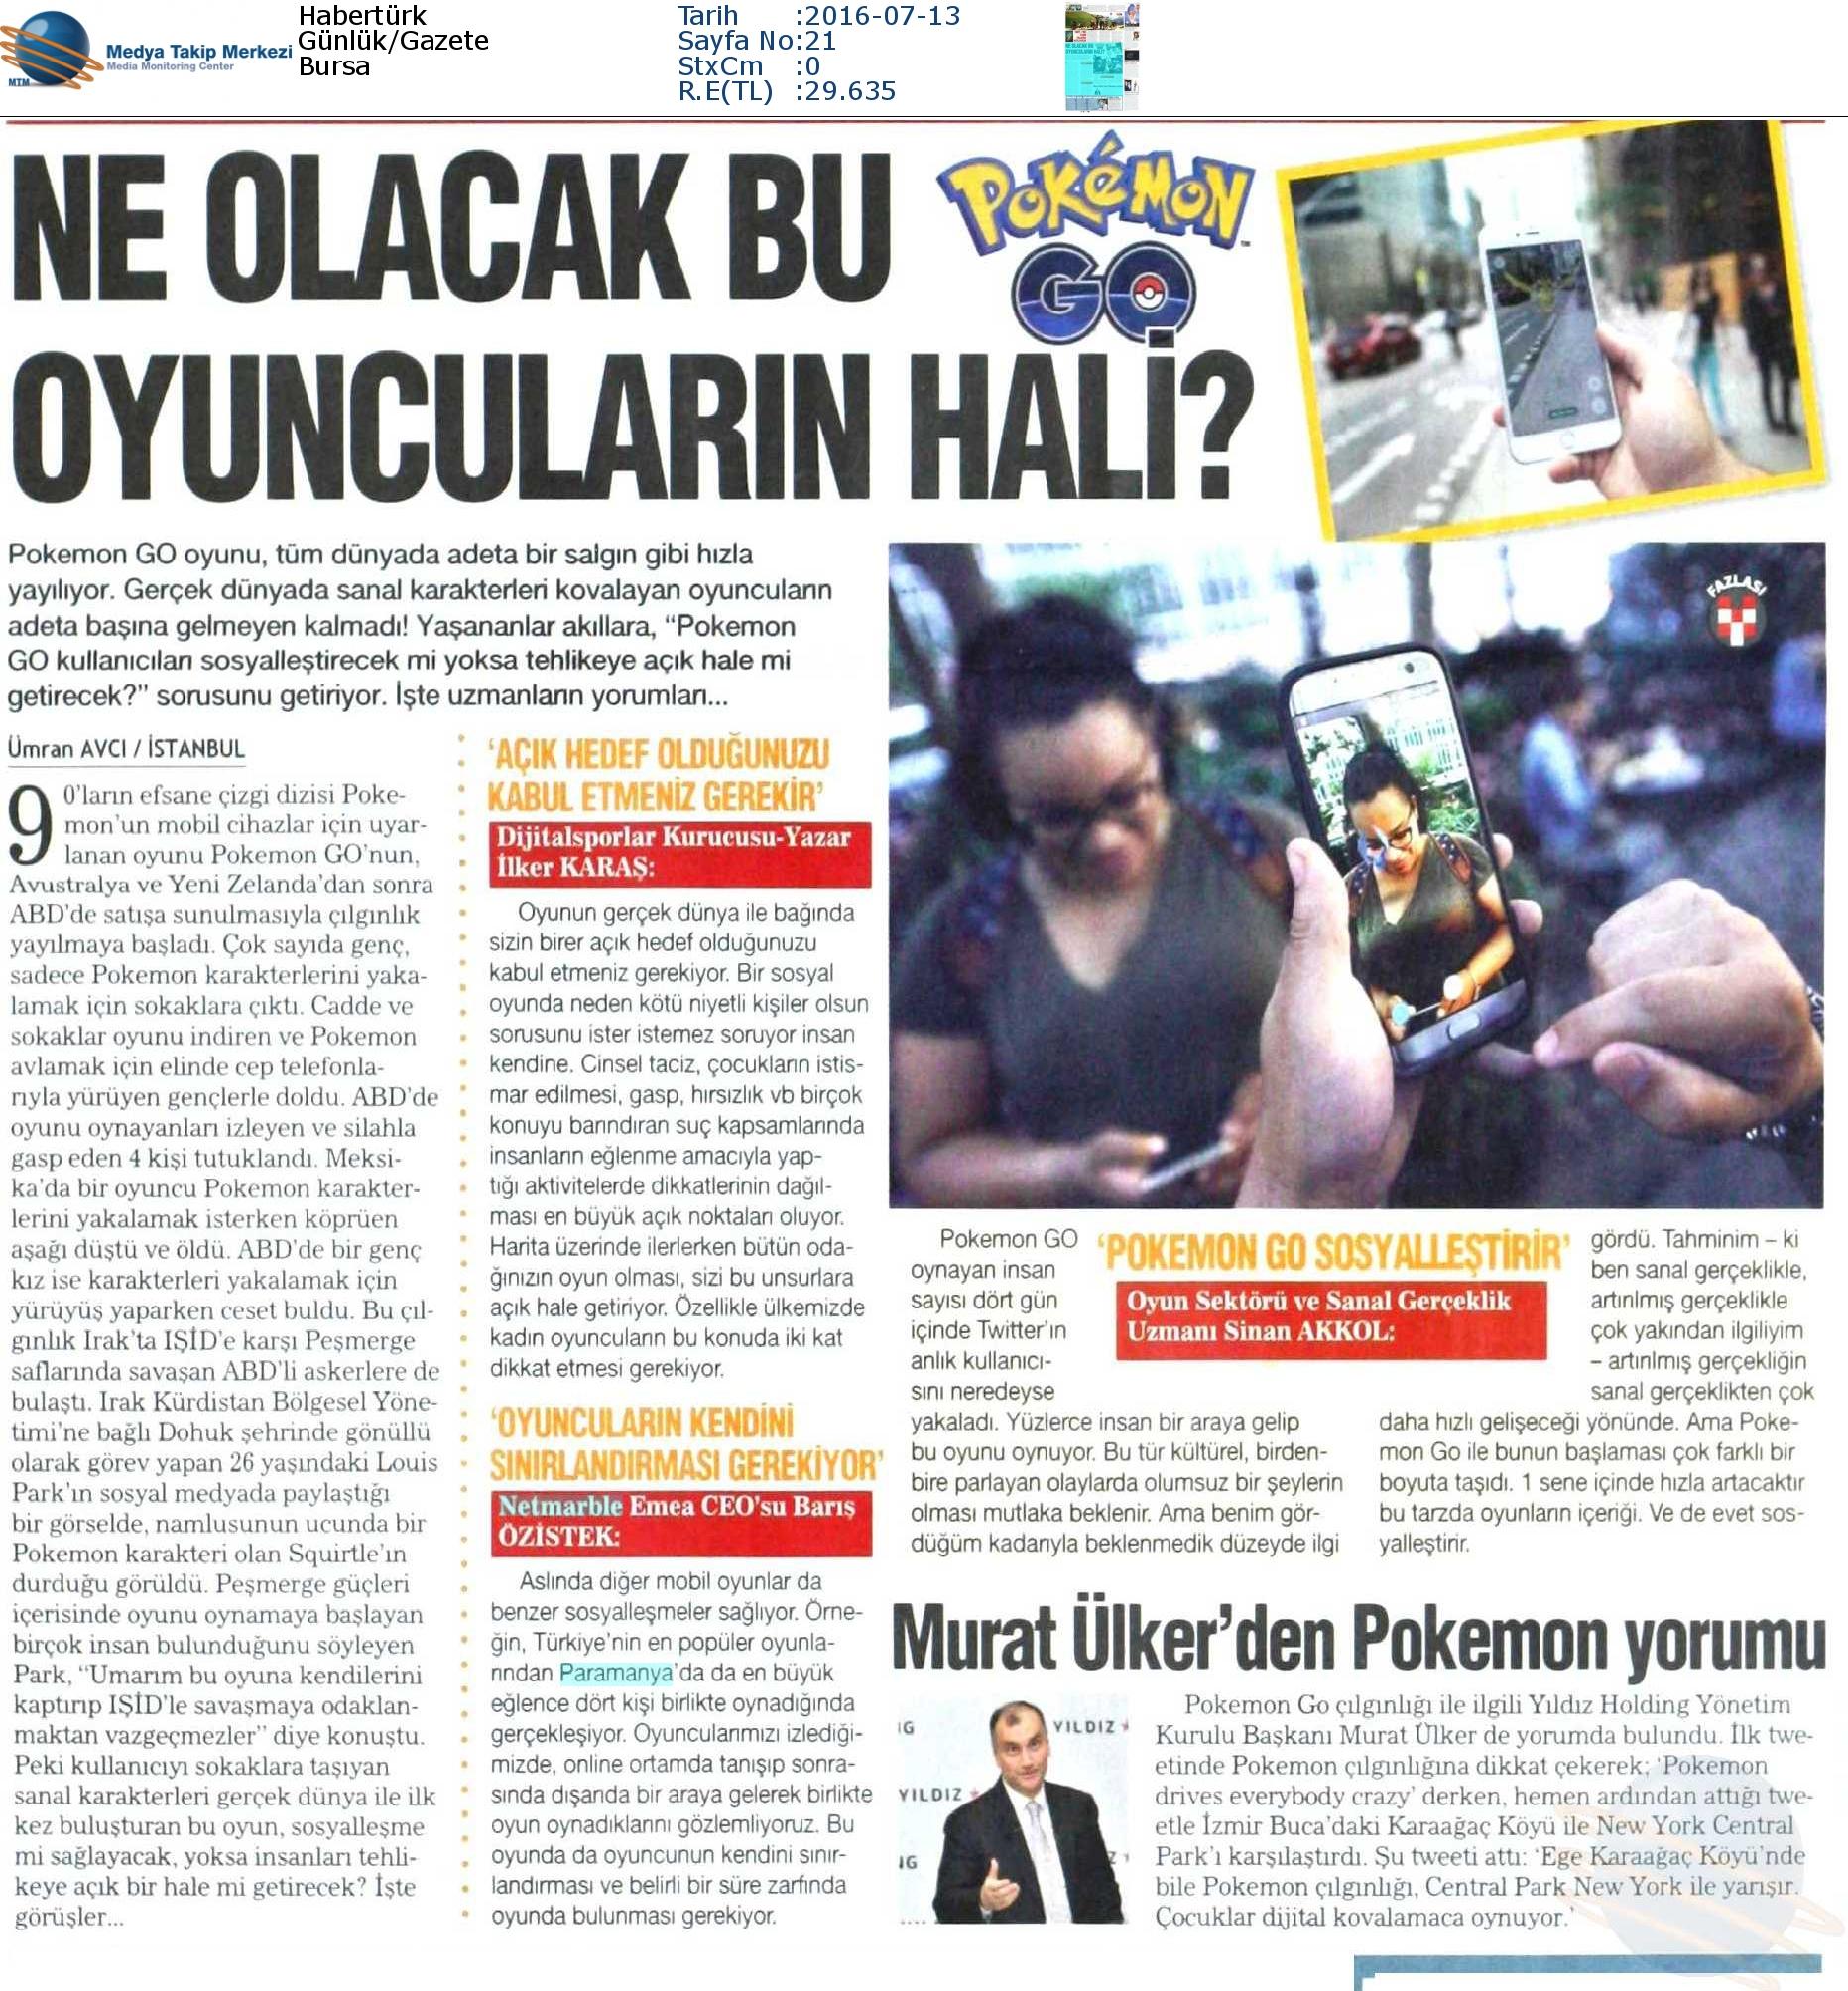 0713_haberturkbursa_netmarble_barisozistek